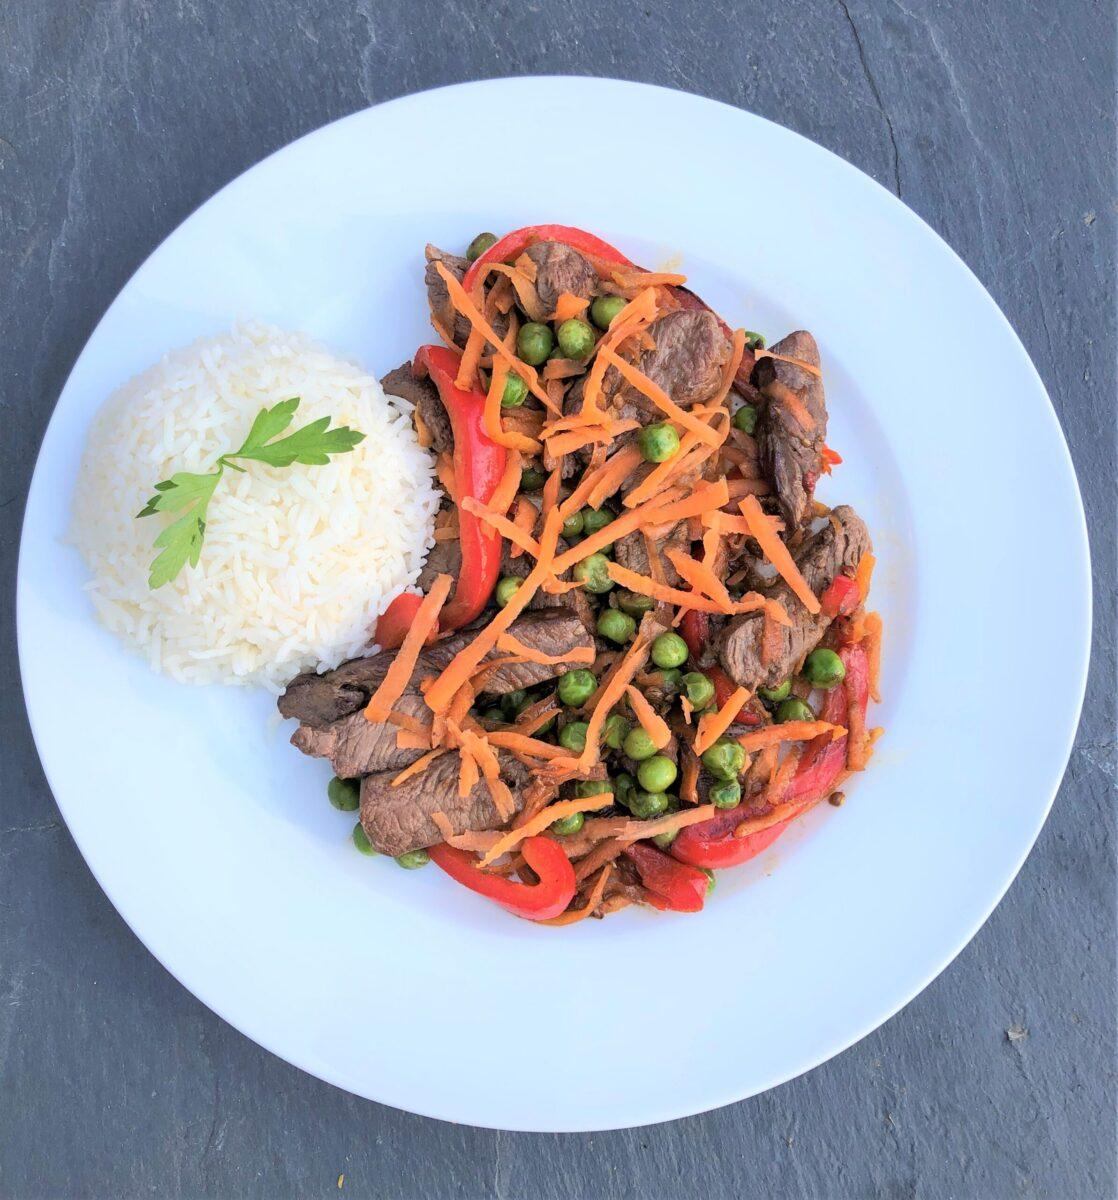 Beef-Stir-Fry-peppers-carrots-peas-rice